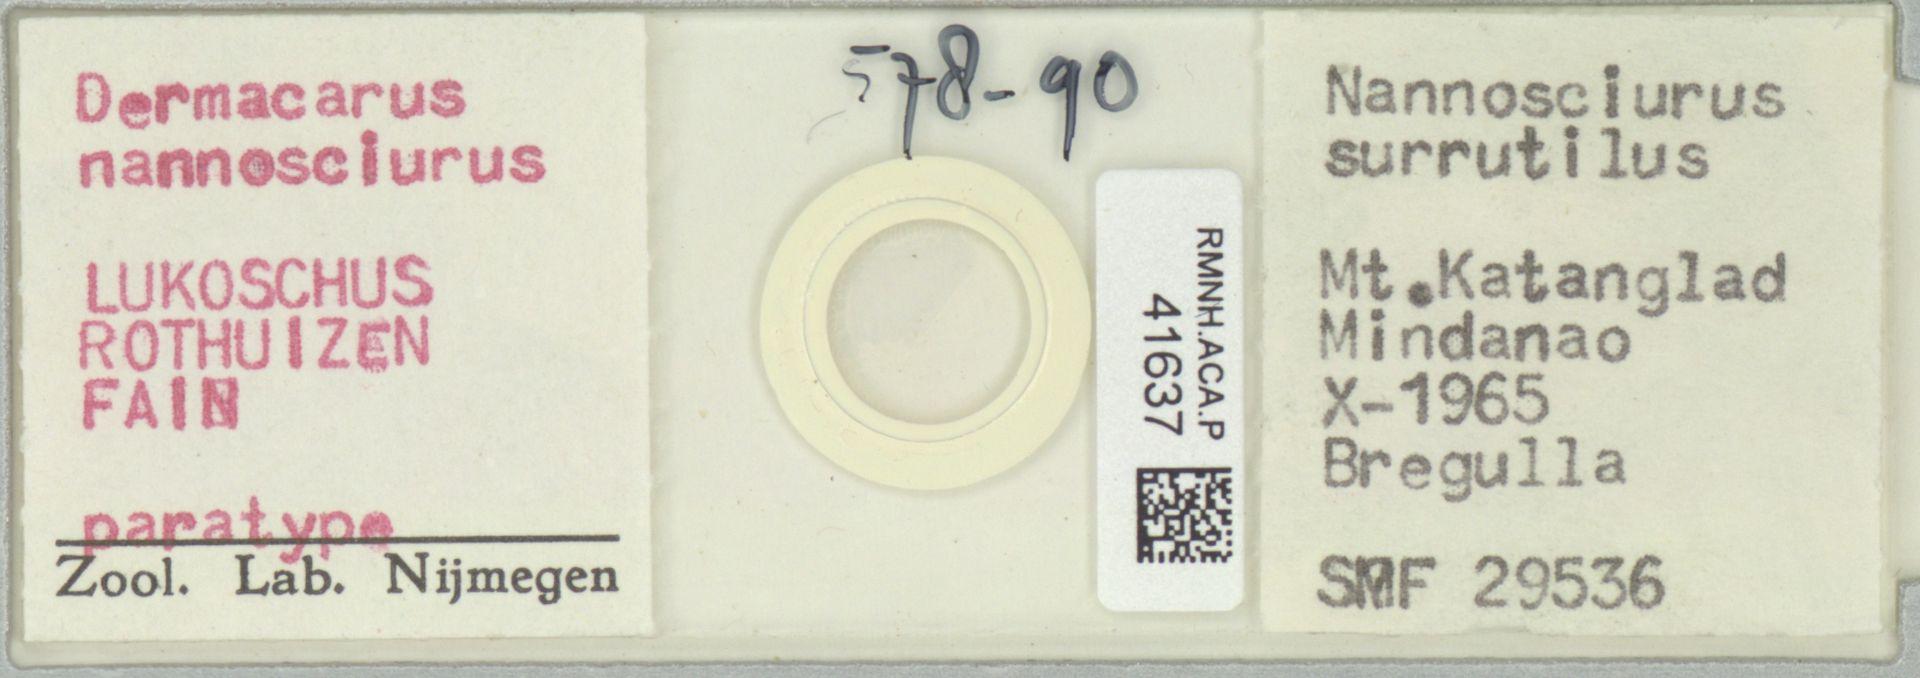 RMNH.ACA.P.41637   Dermacarus nannosciurus Lukoschus, Rothuizen, Fain